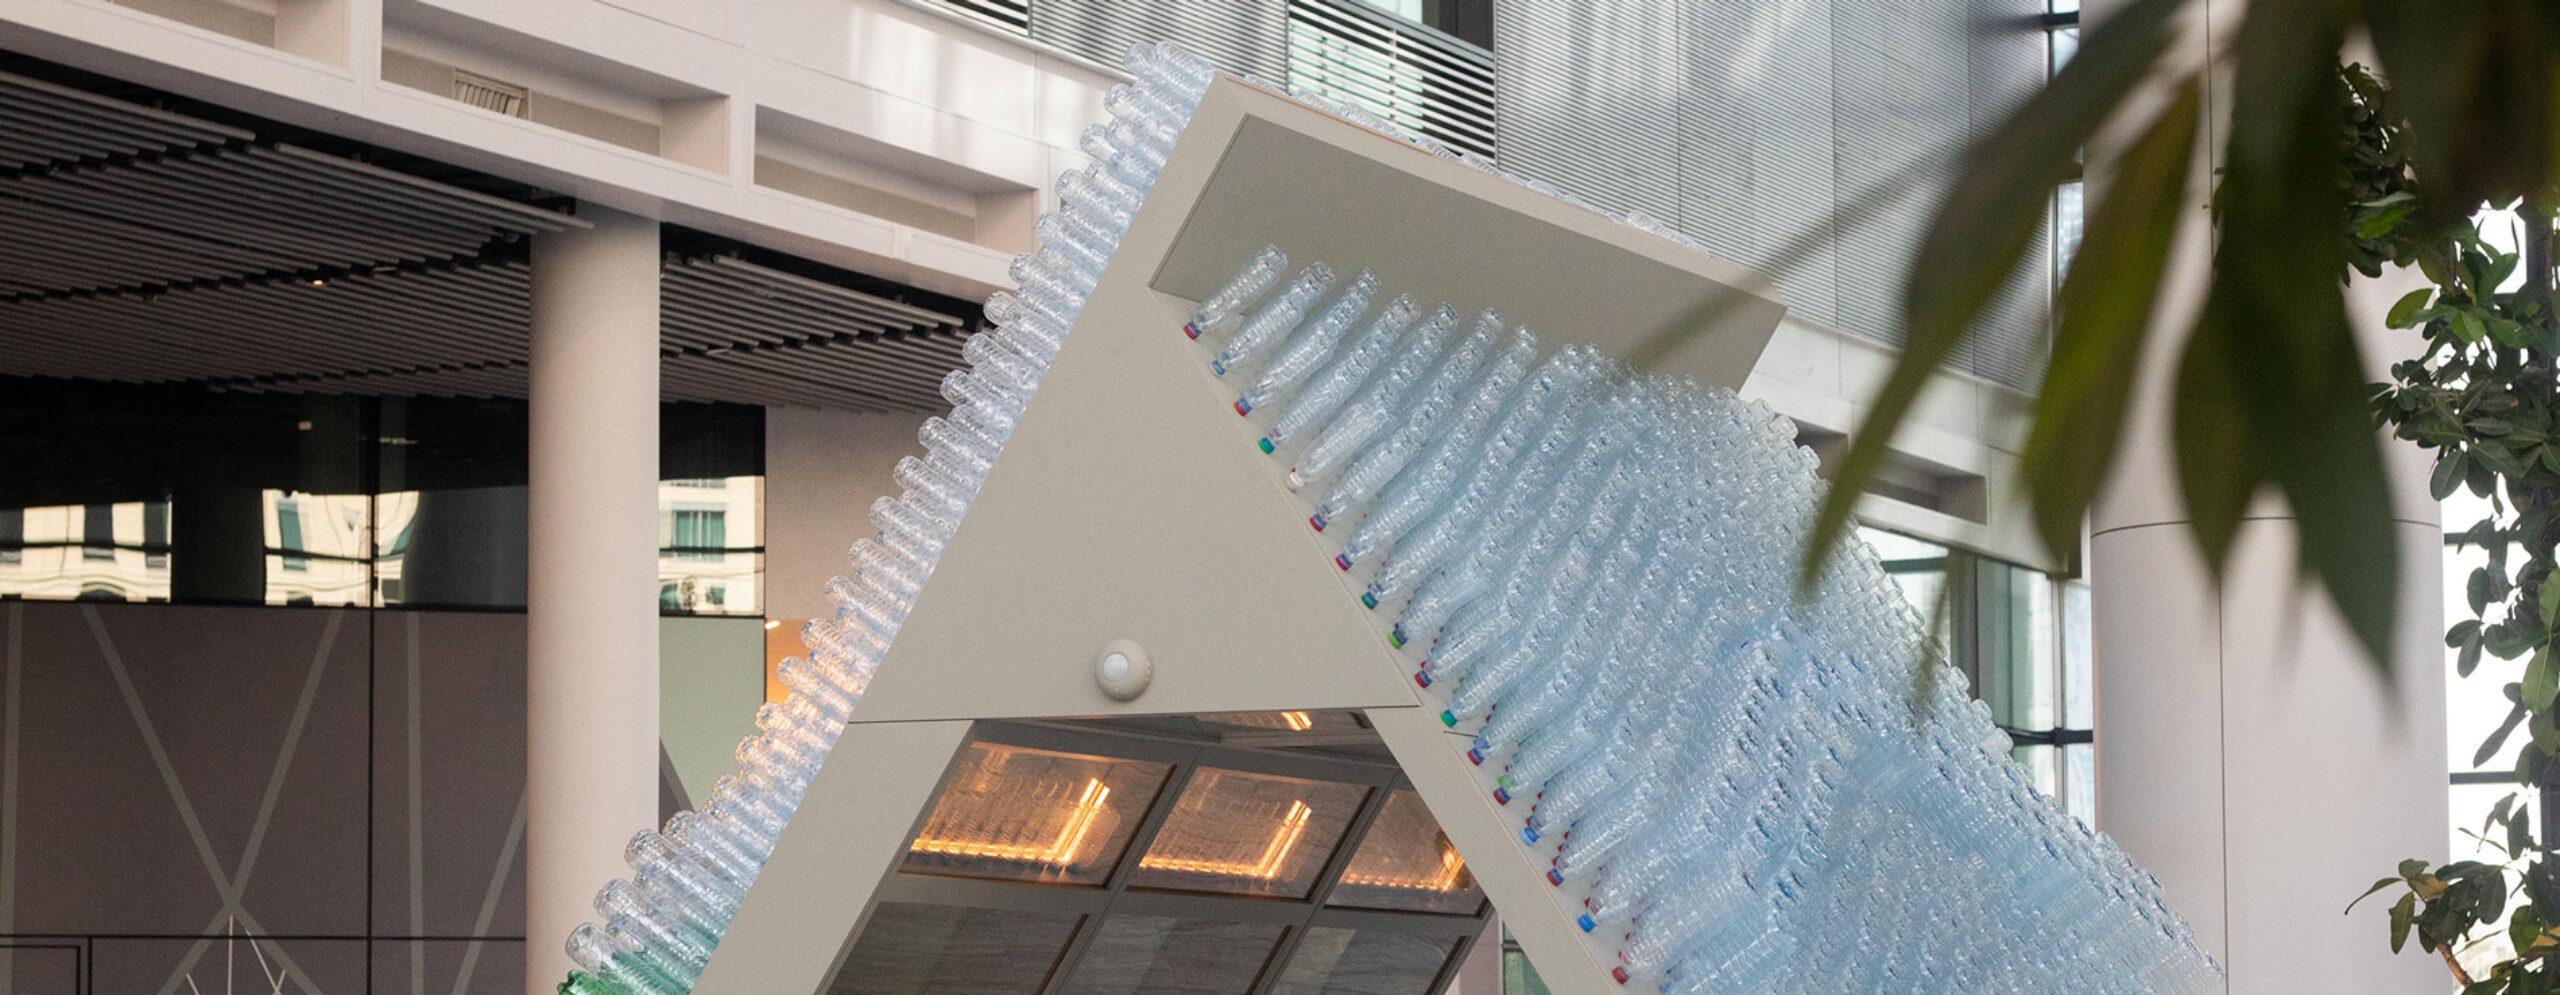 ICD Brookfield Place Dubai Breaking The Plastic Habit